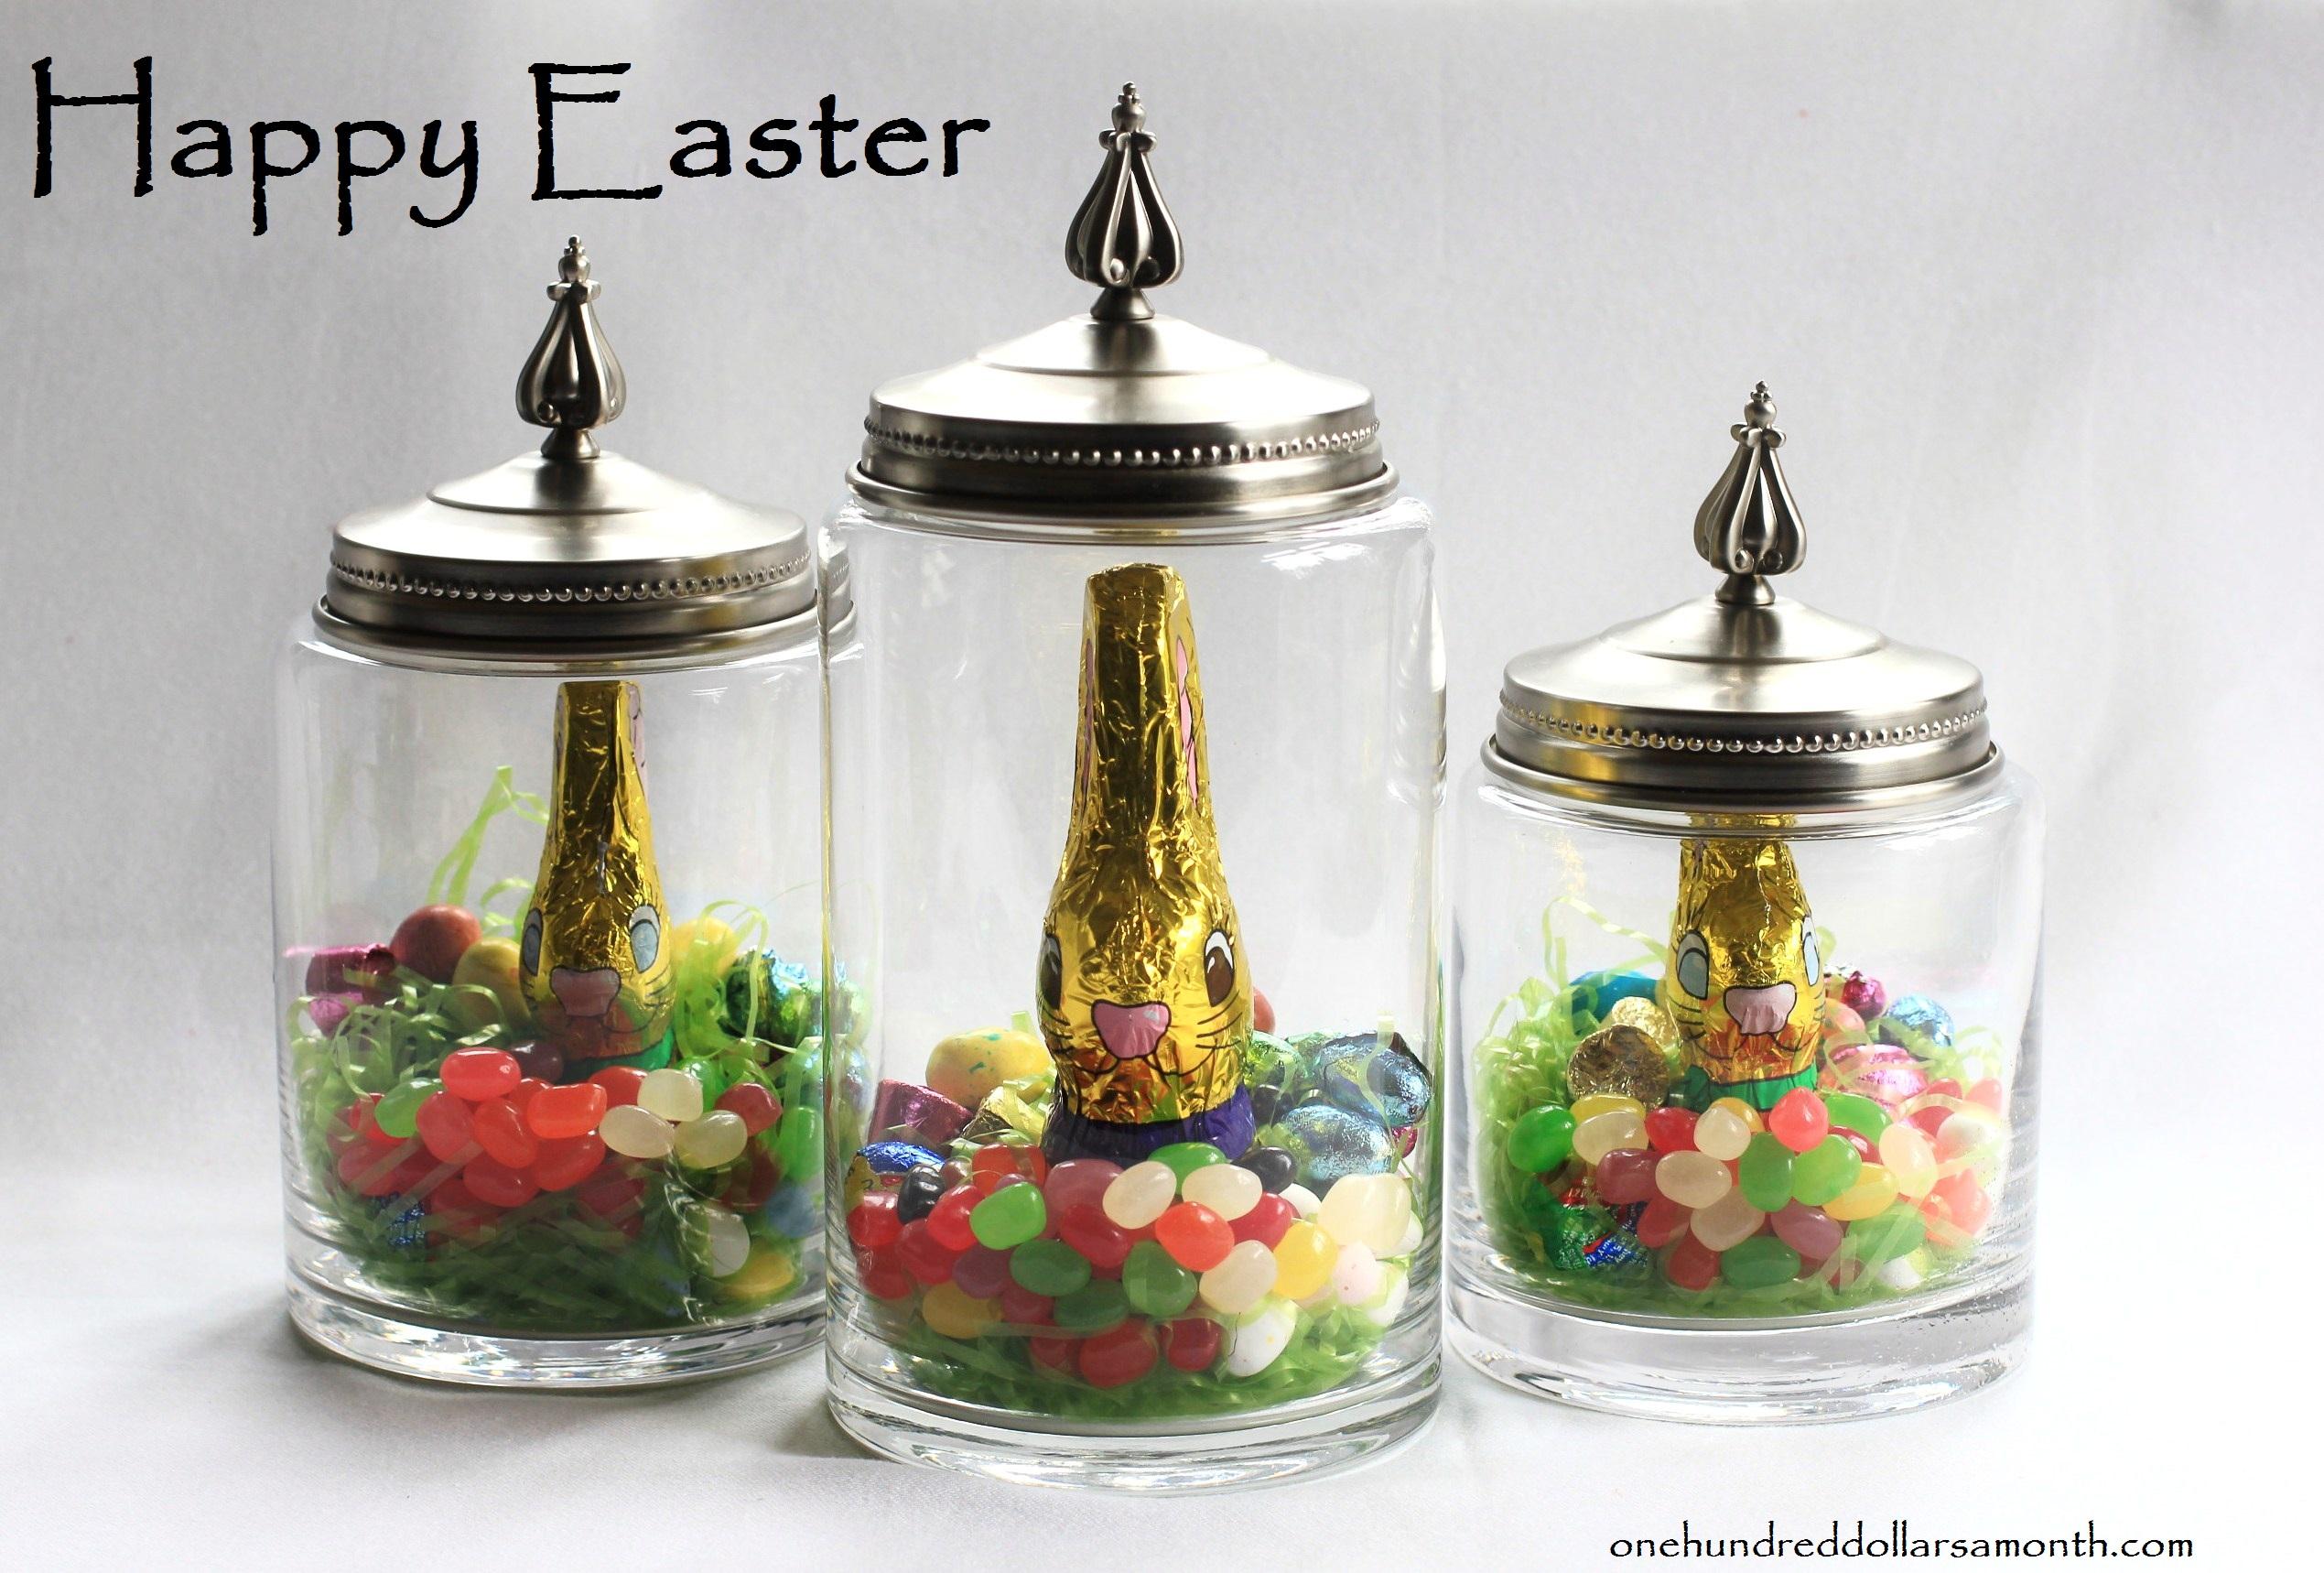 Last Minute Easter Idea: Treats in Glass Jars